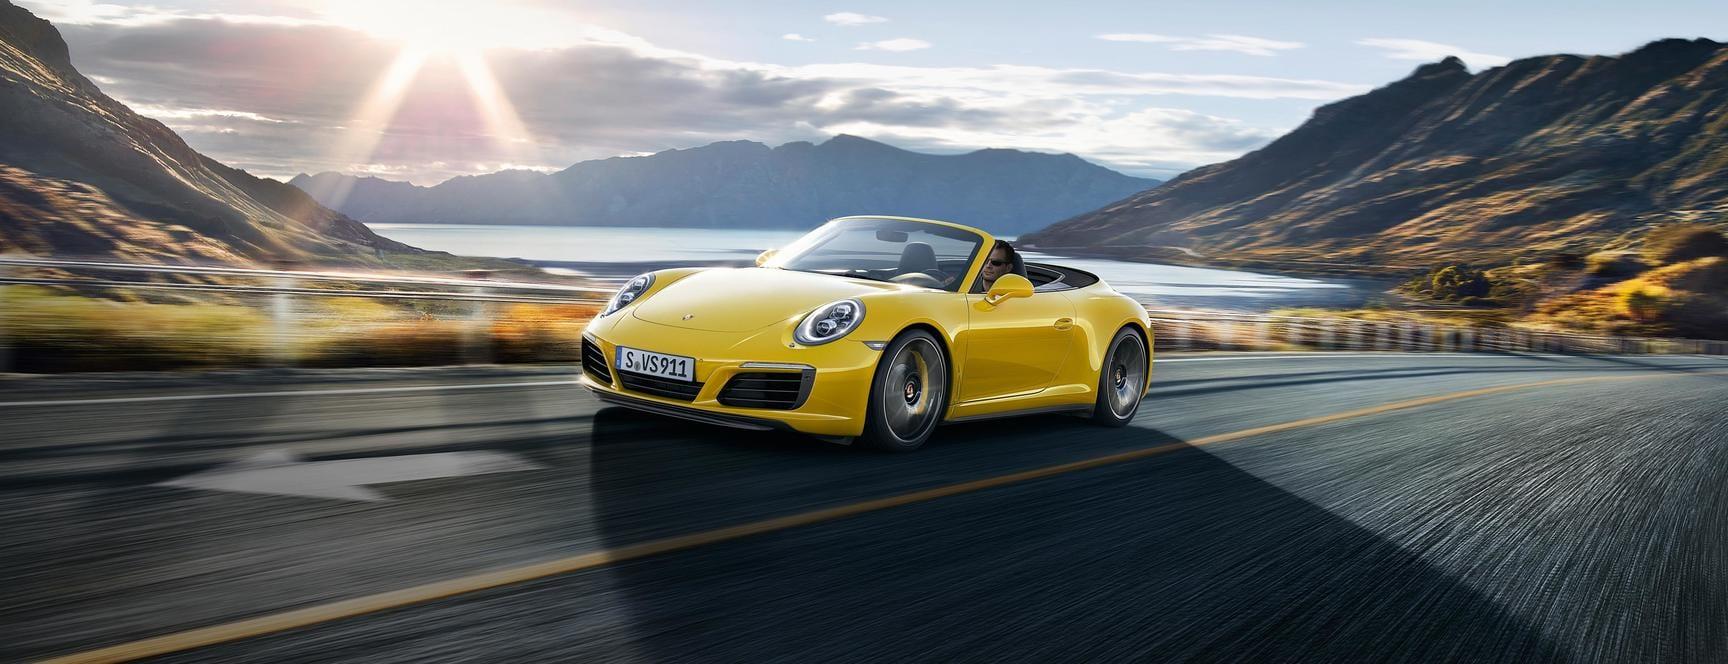 Location Porsche 911 Carrera 4 Cabriolet   Deluxe Rental Cars Lausanne